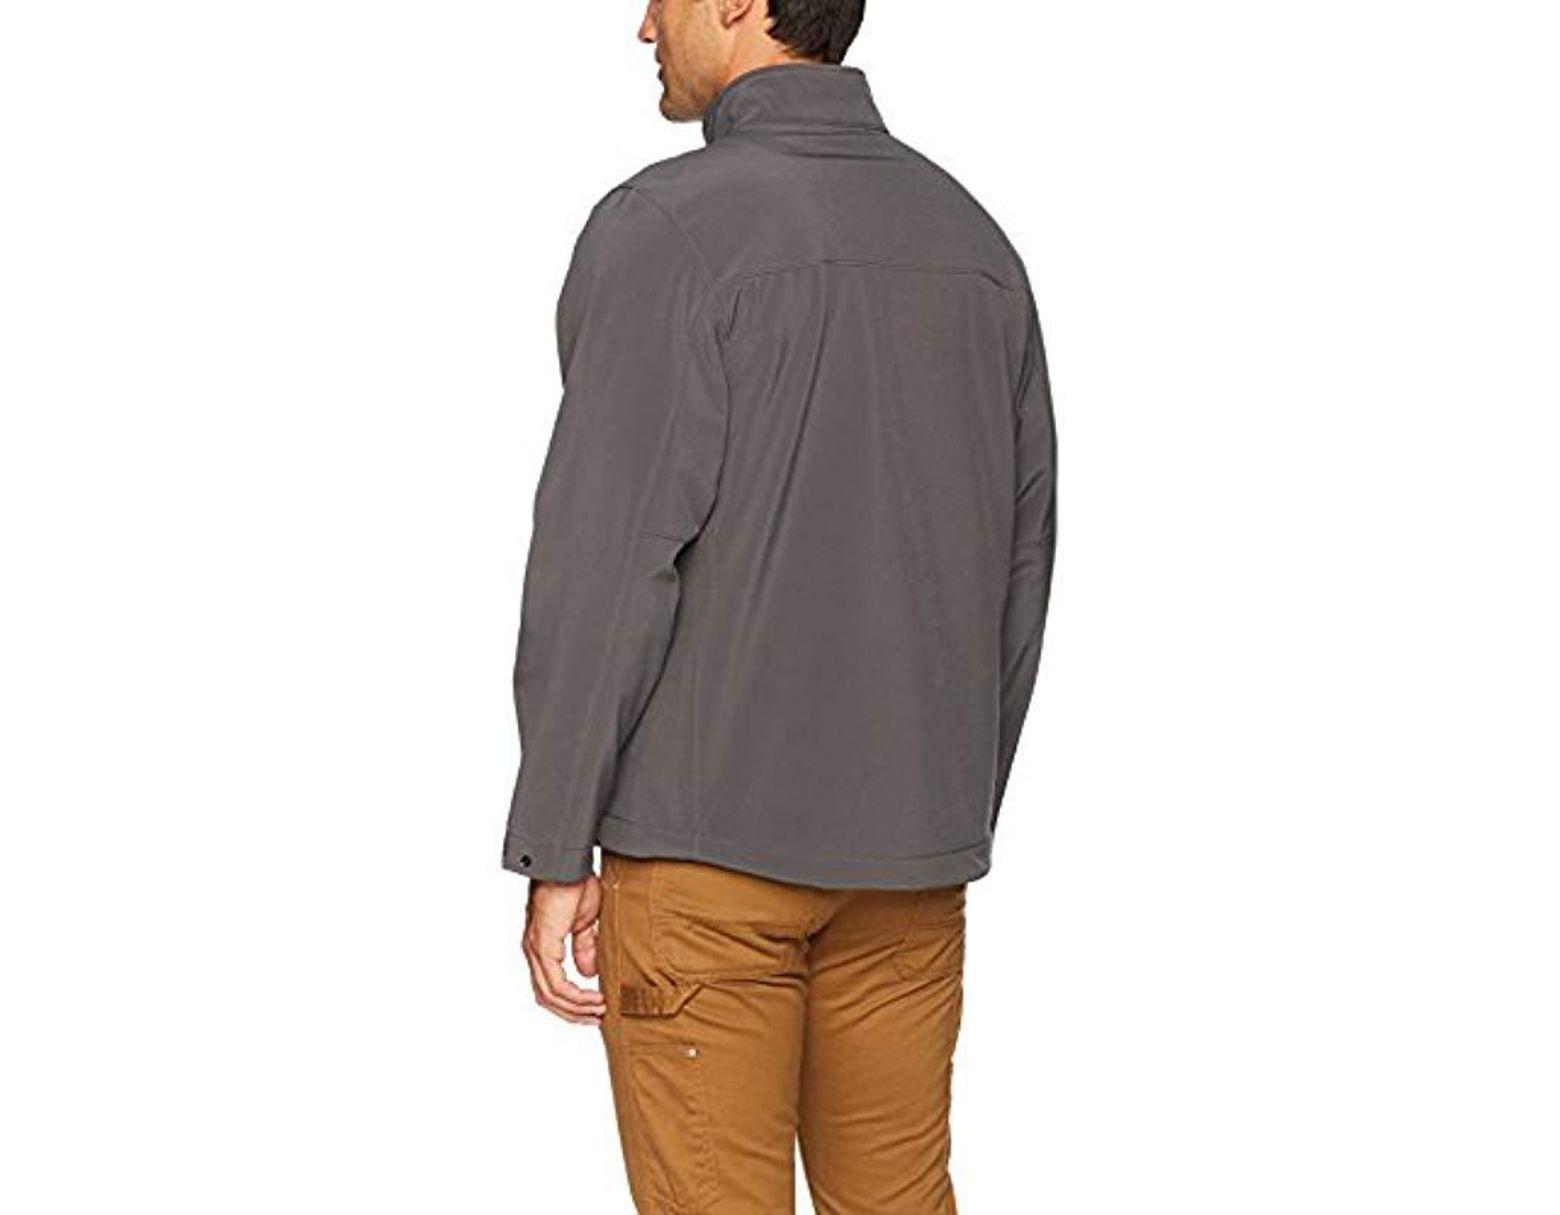 d66fe30d267 Timberland Power Zip Windproof Softshell Jacket in Gray for Men ...